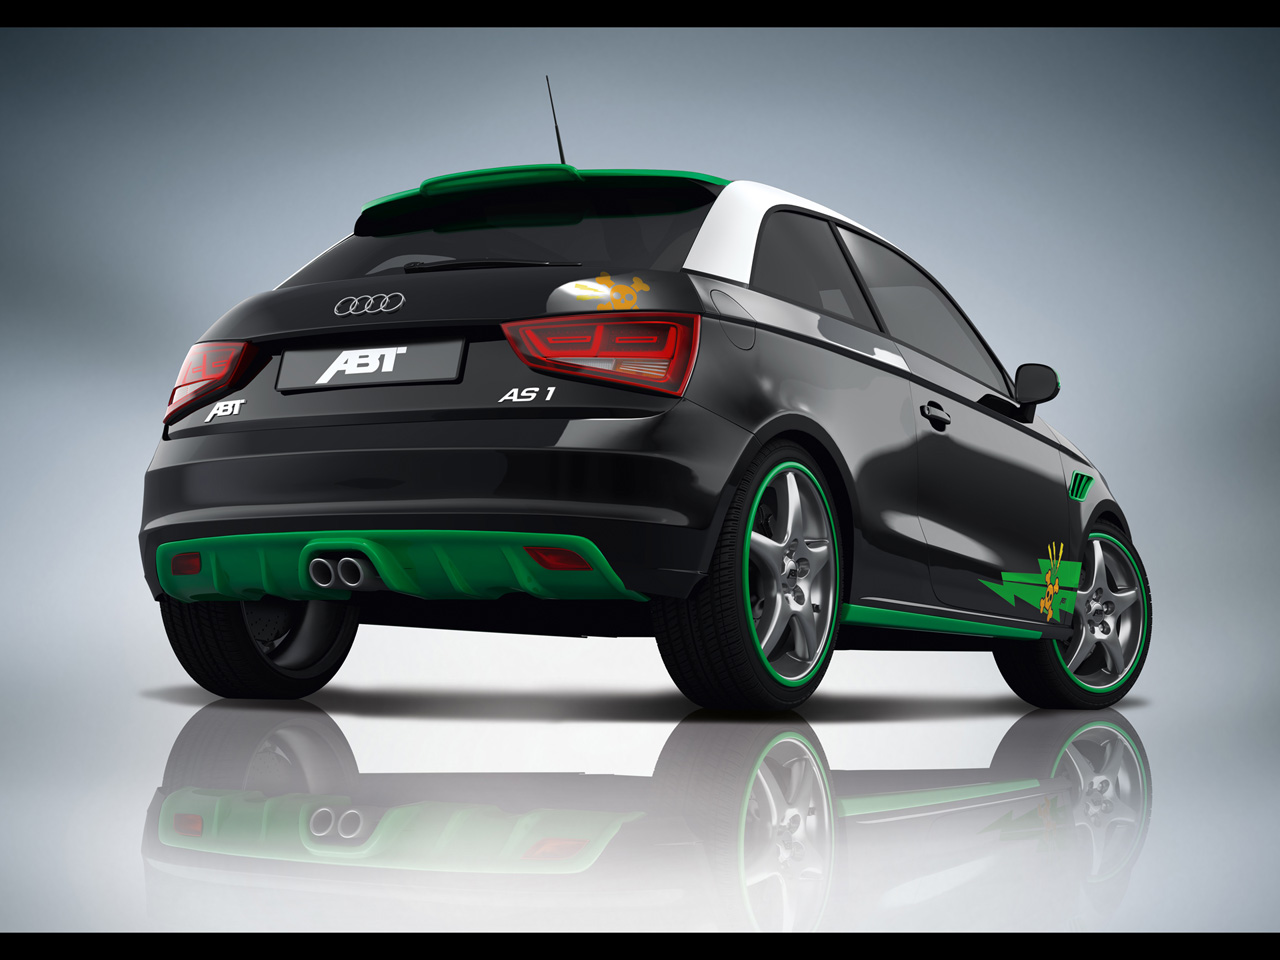 AUDI A1 green